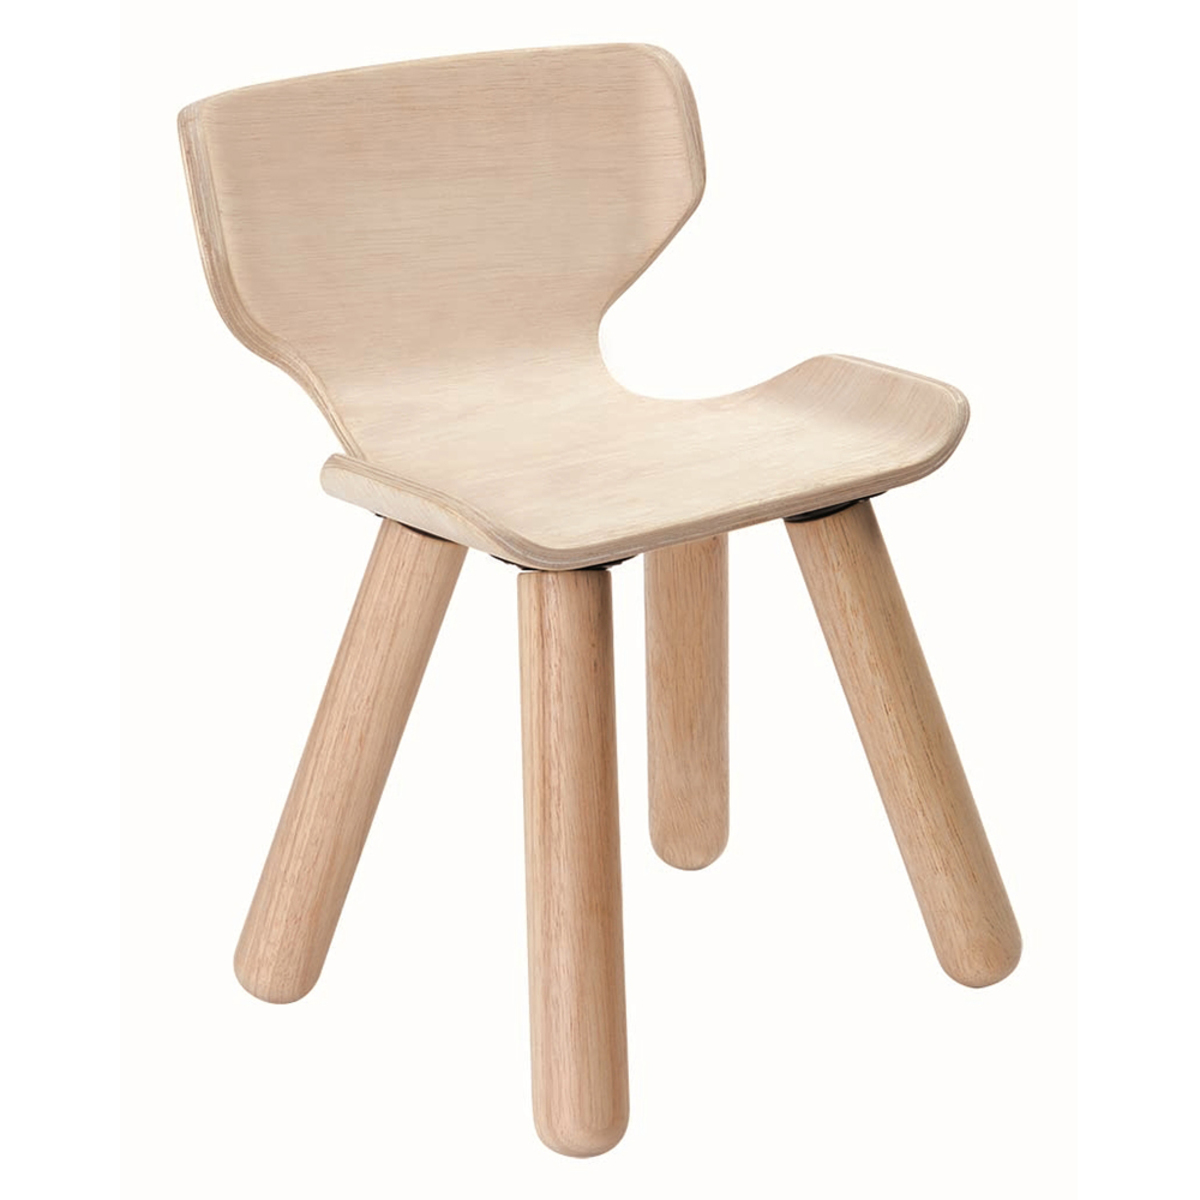 Table & Chaise Chaise - Naturel Chaise - Naturel